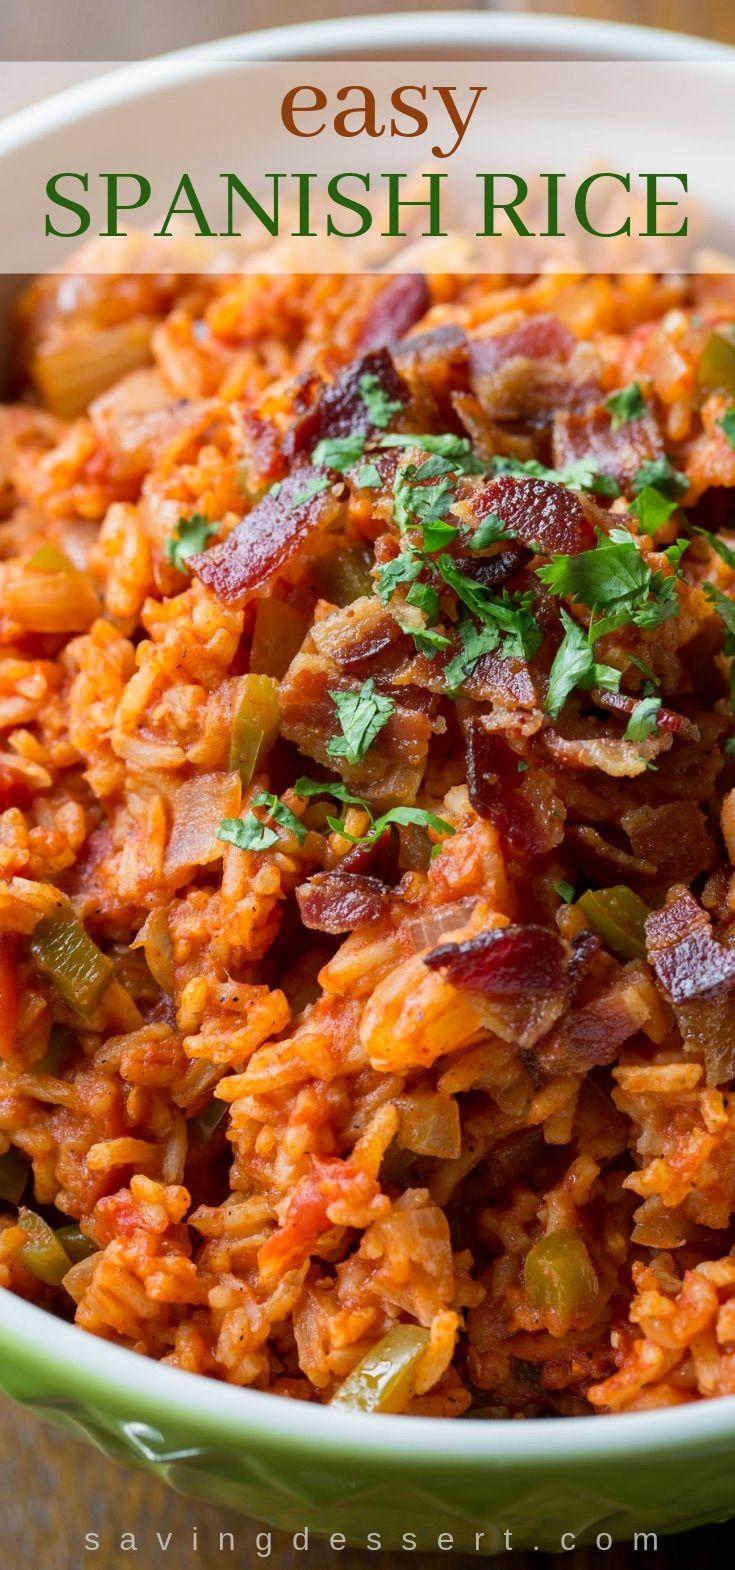 b318ddb8687e431d66e232e265399264 - Better Homes And Gardens Spanish Rice Recipe